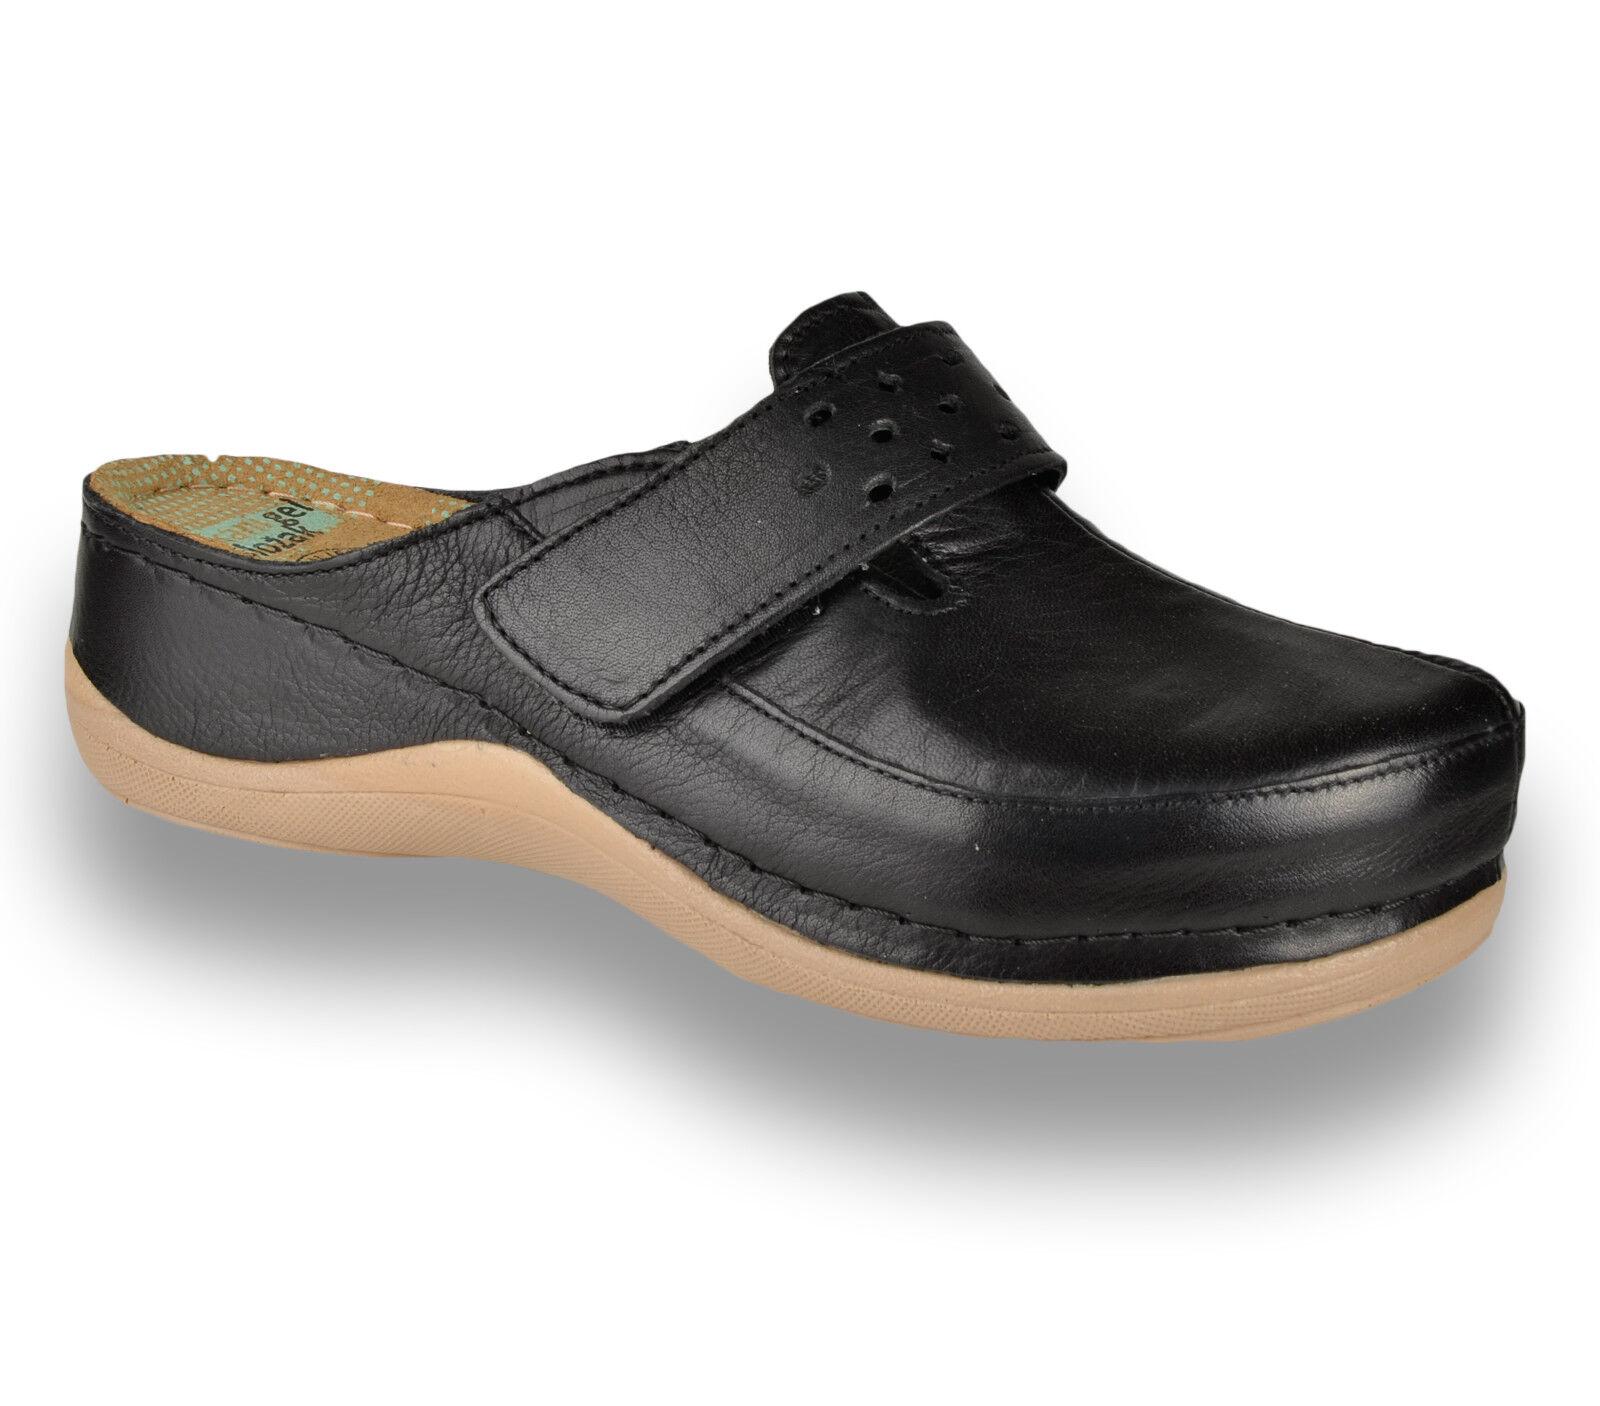 Leon 902 Damas Mujeres Zuecos Cuero Slip On Mulas Zapatillas Sandalias, Negro nuevo Reino Unido